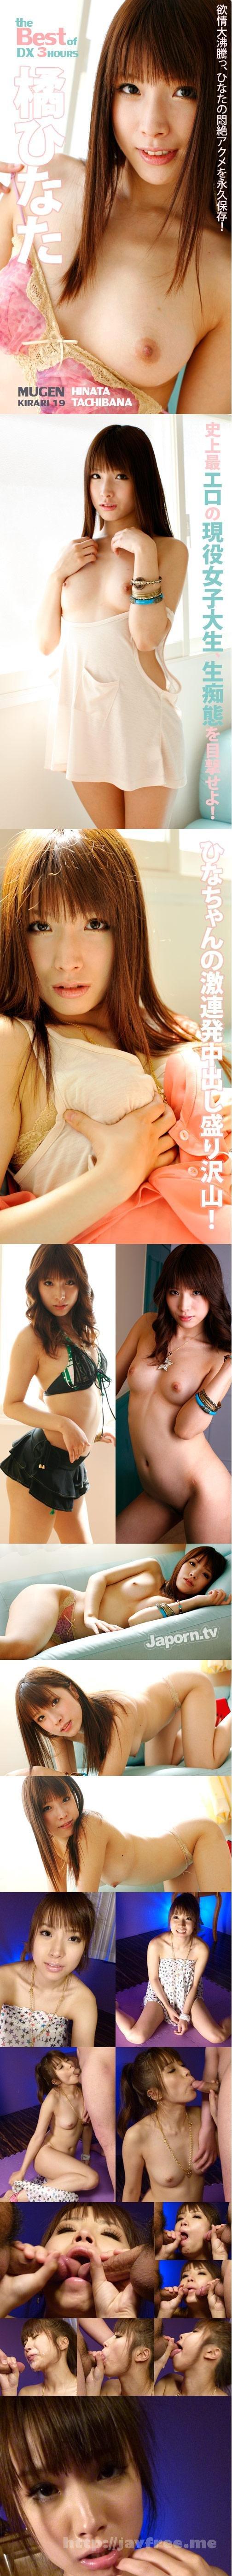 [MKBD-S19][MKD-S19] KIRARI 19 : Hinata Tachibana - image MKBD-S19_1 on https://javfree.me